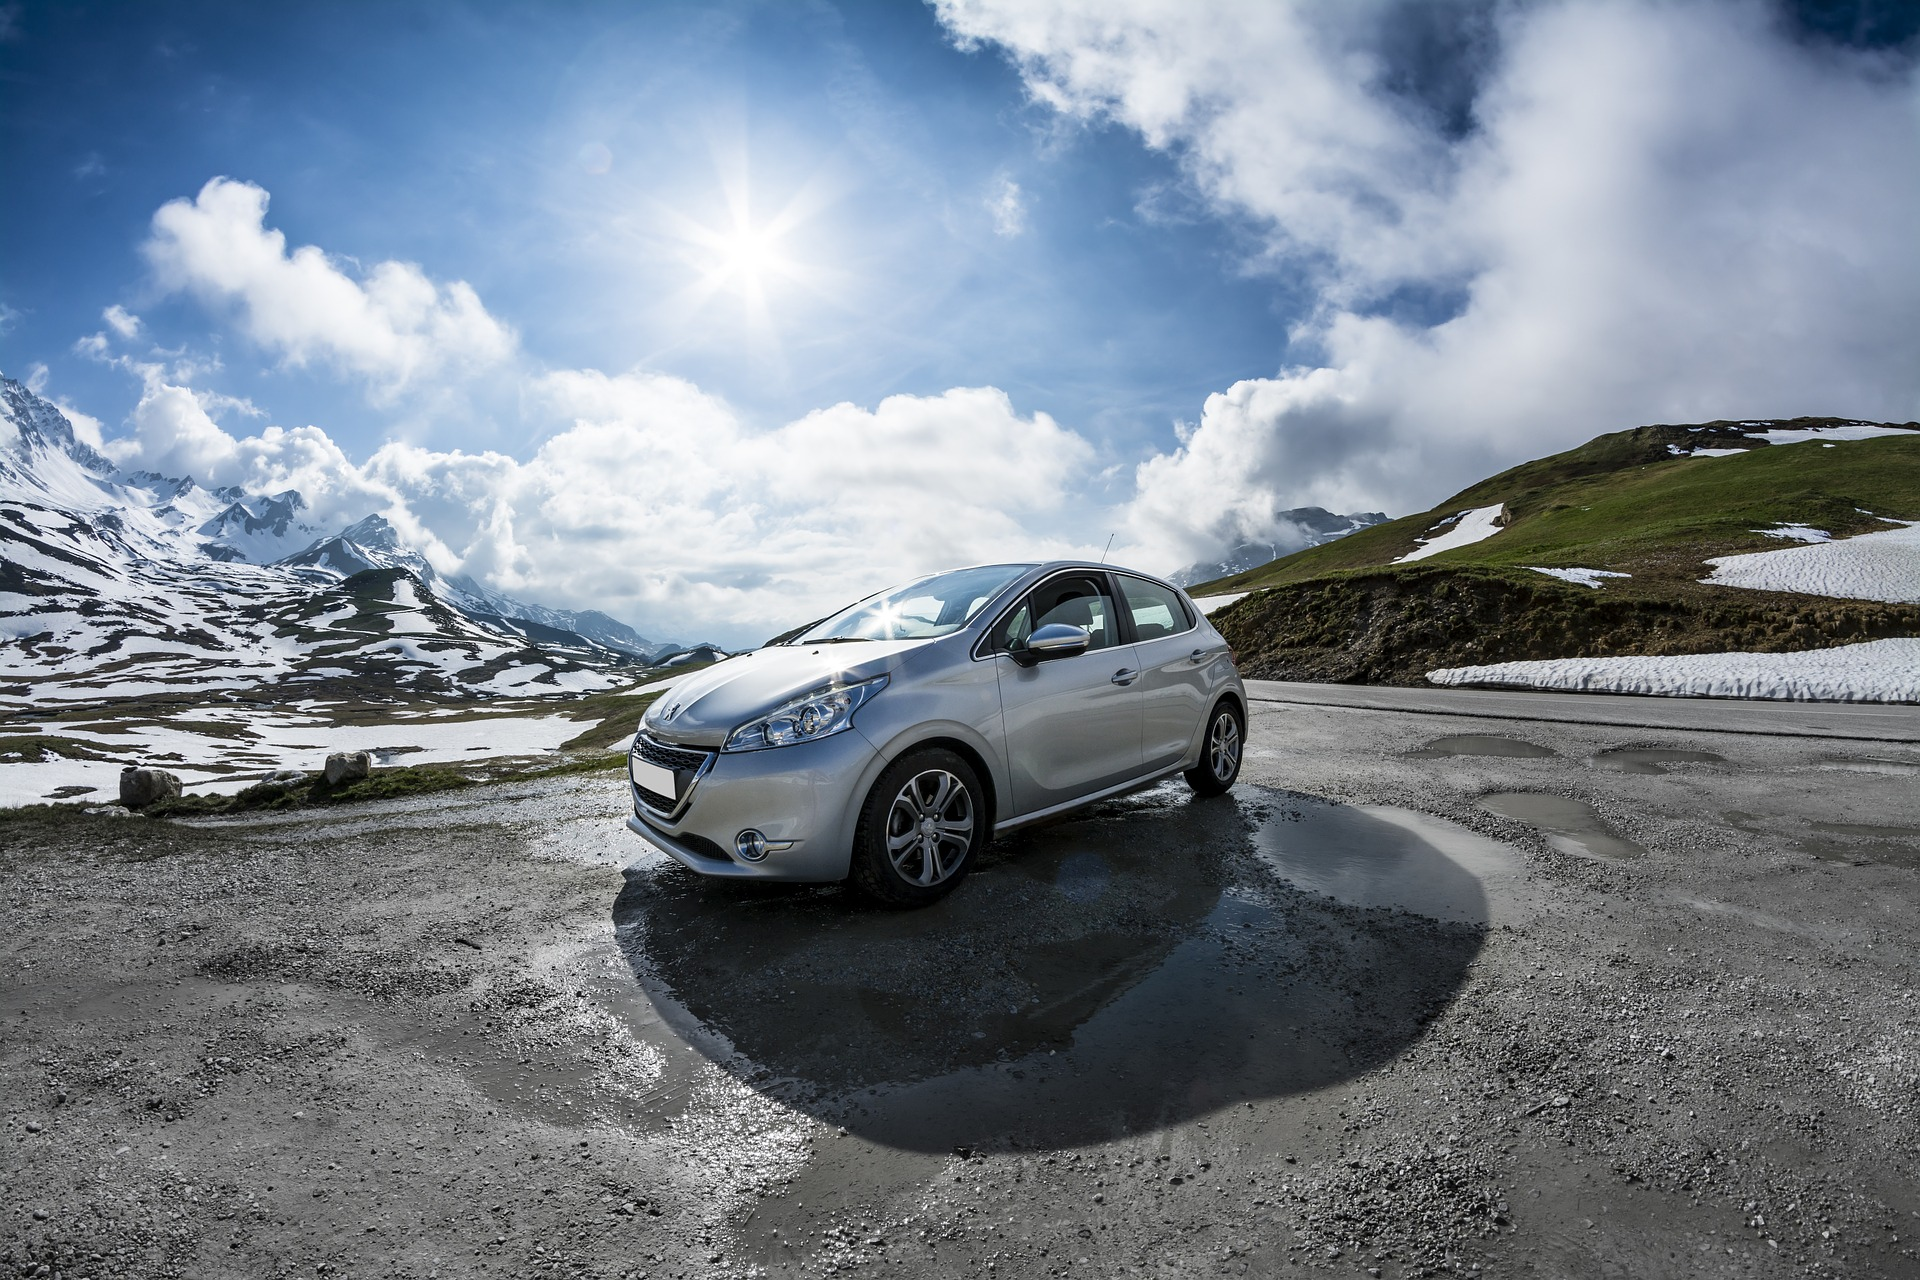 Торги акциями объединения Peugeot и Fiat Chrysler стартуют 18 января